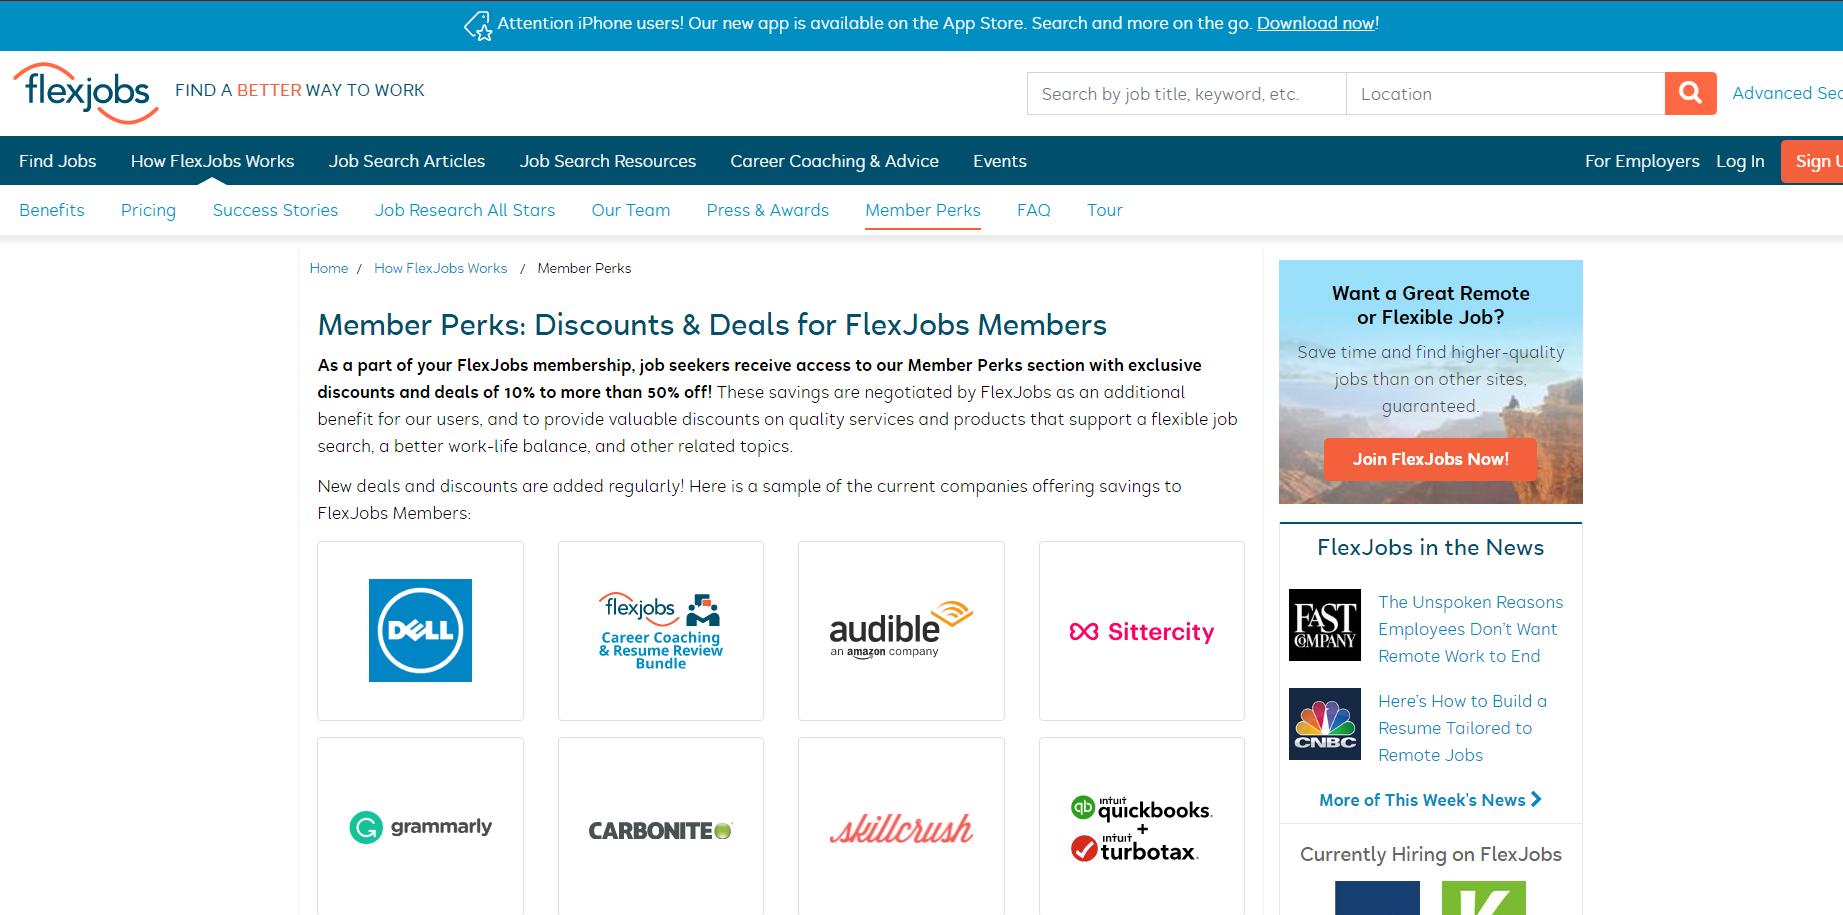 flexjobs member discounts